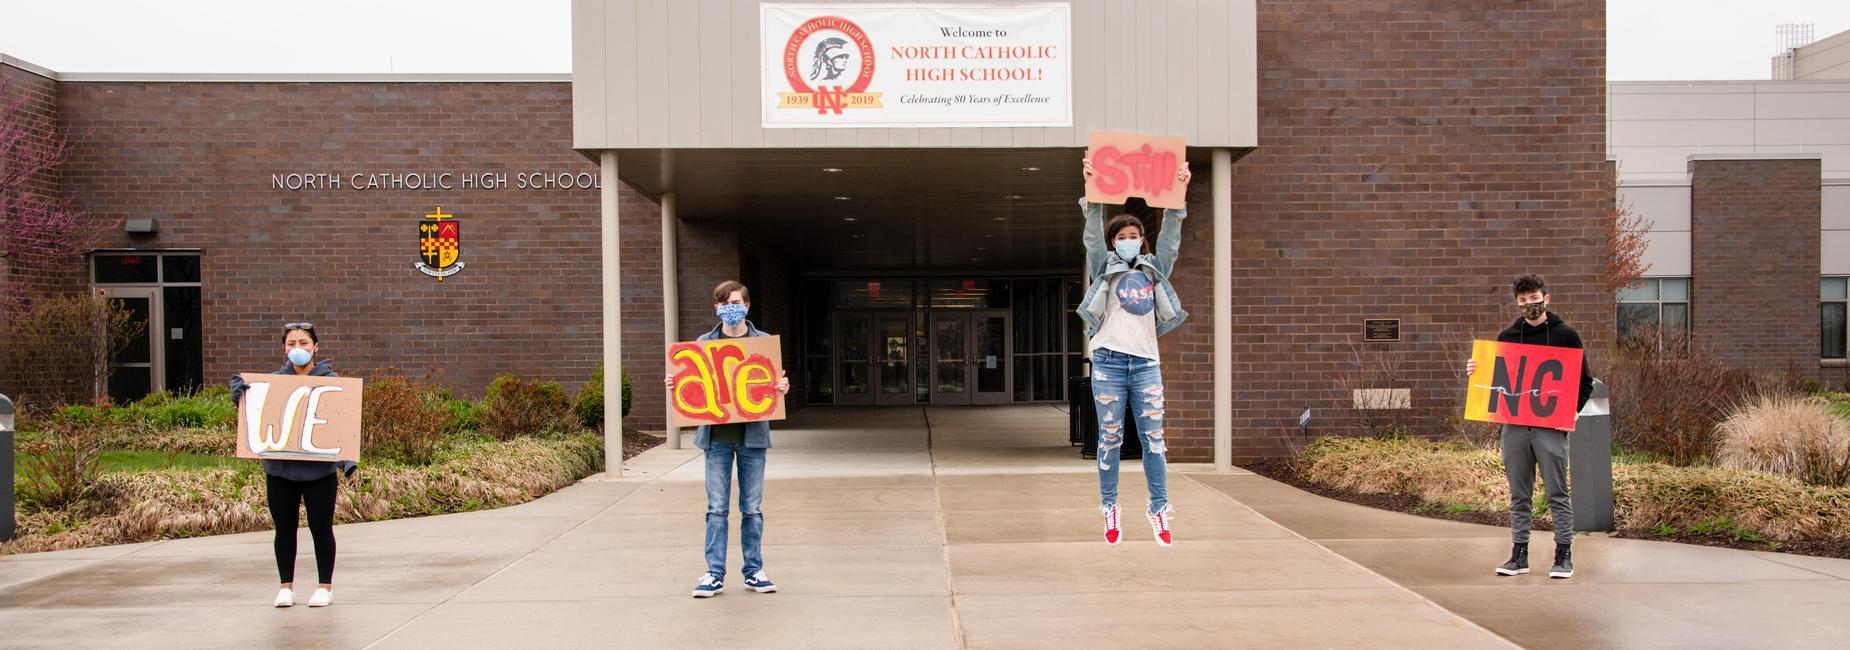 We are NC North Catholic High School